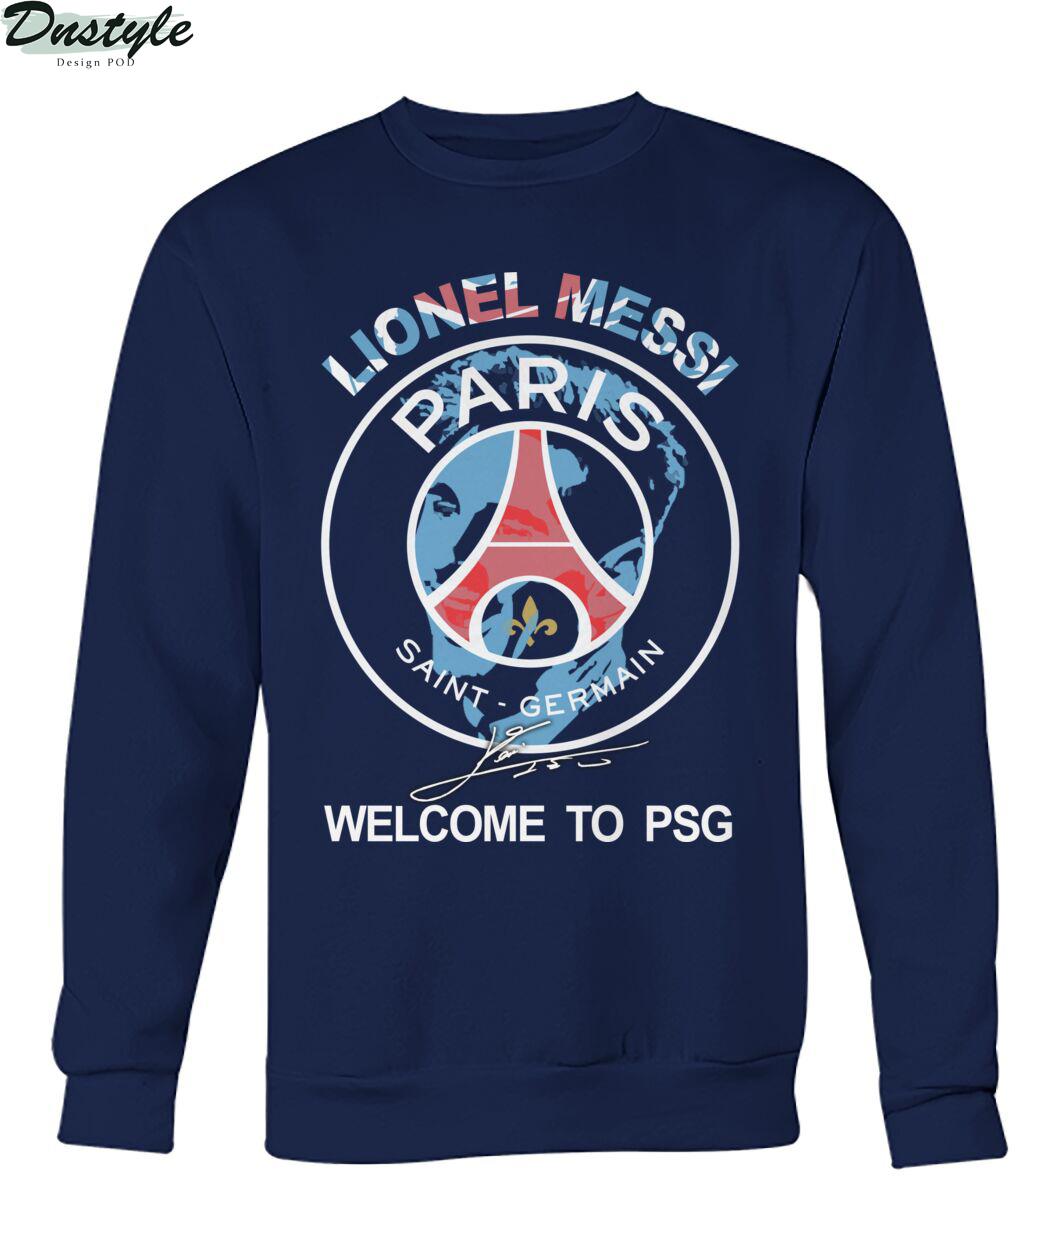 Lionel Messi signature welcome to PSG sweatshirt